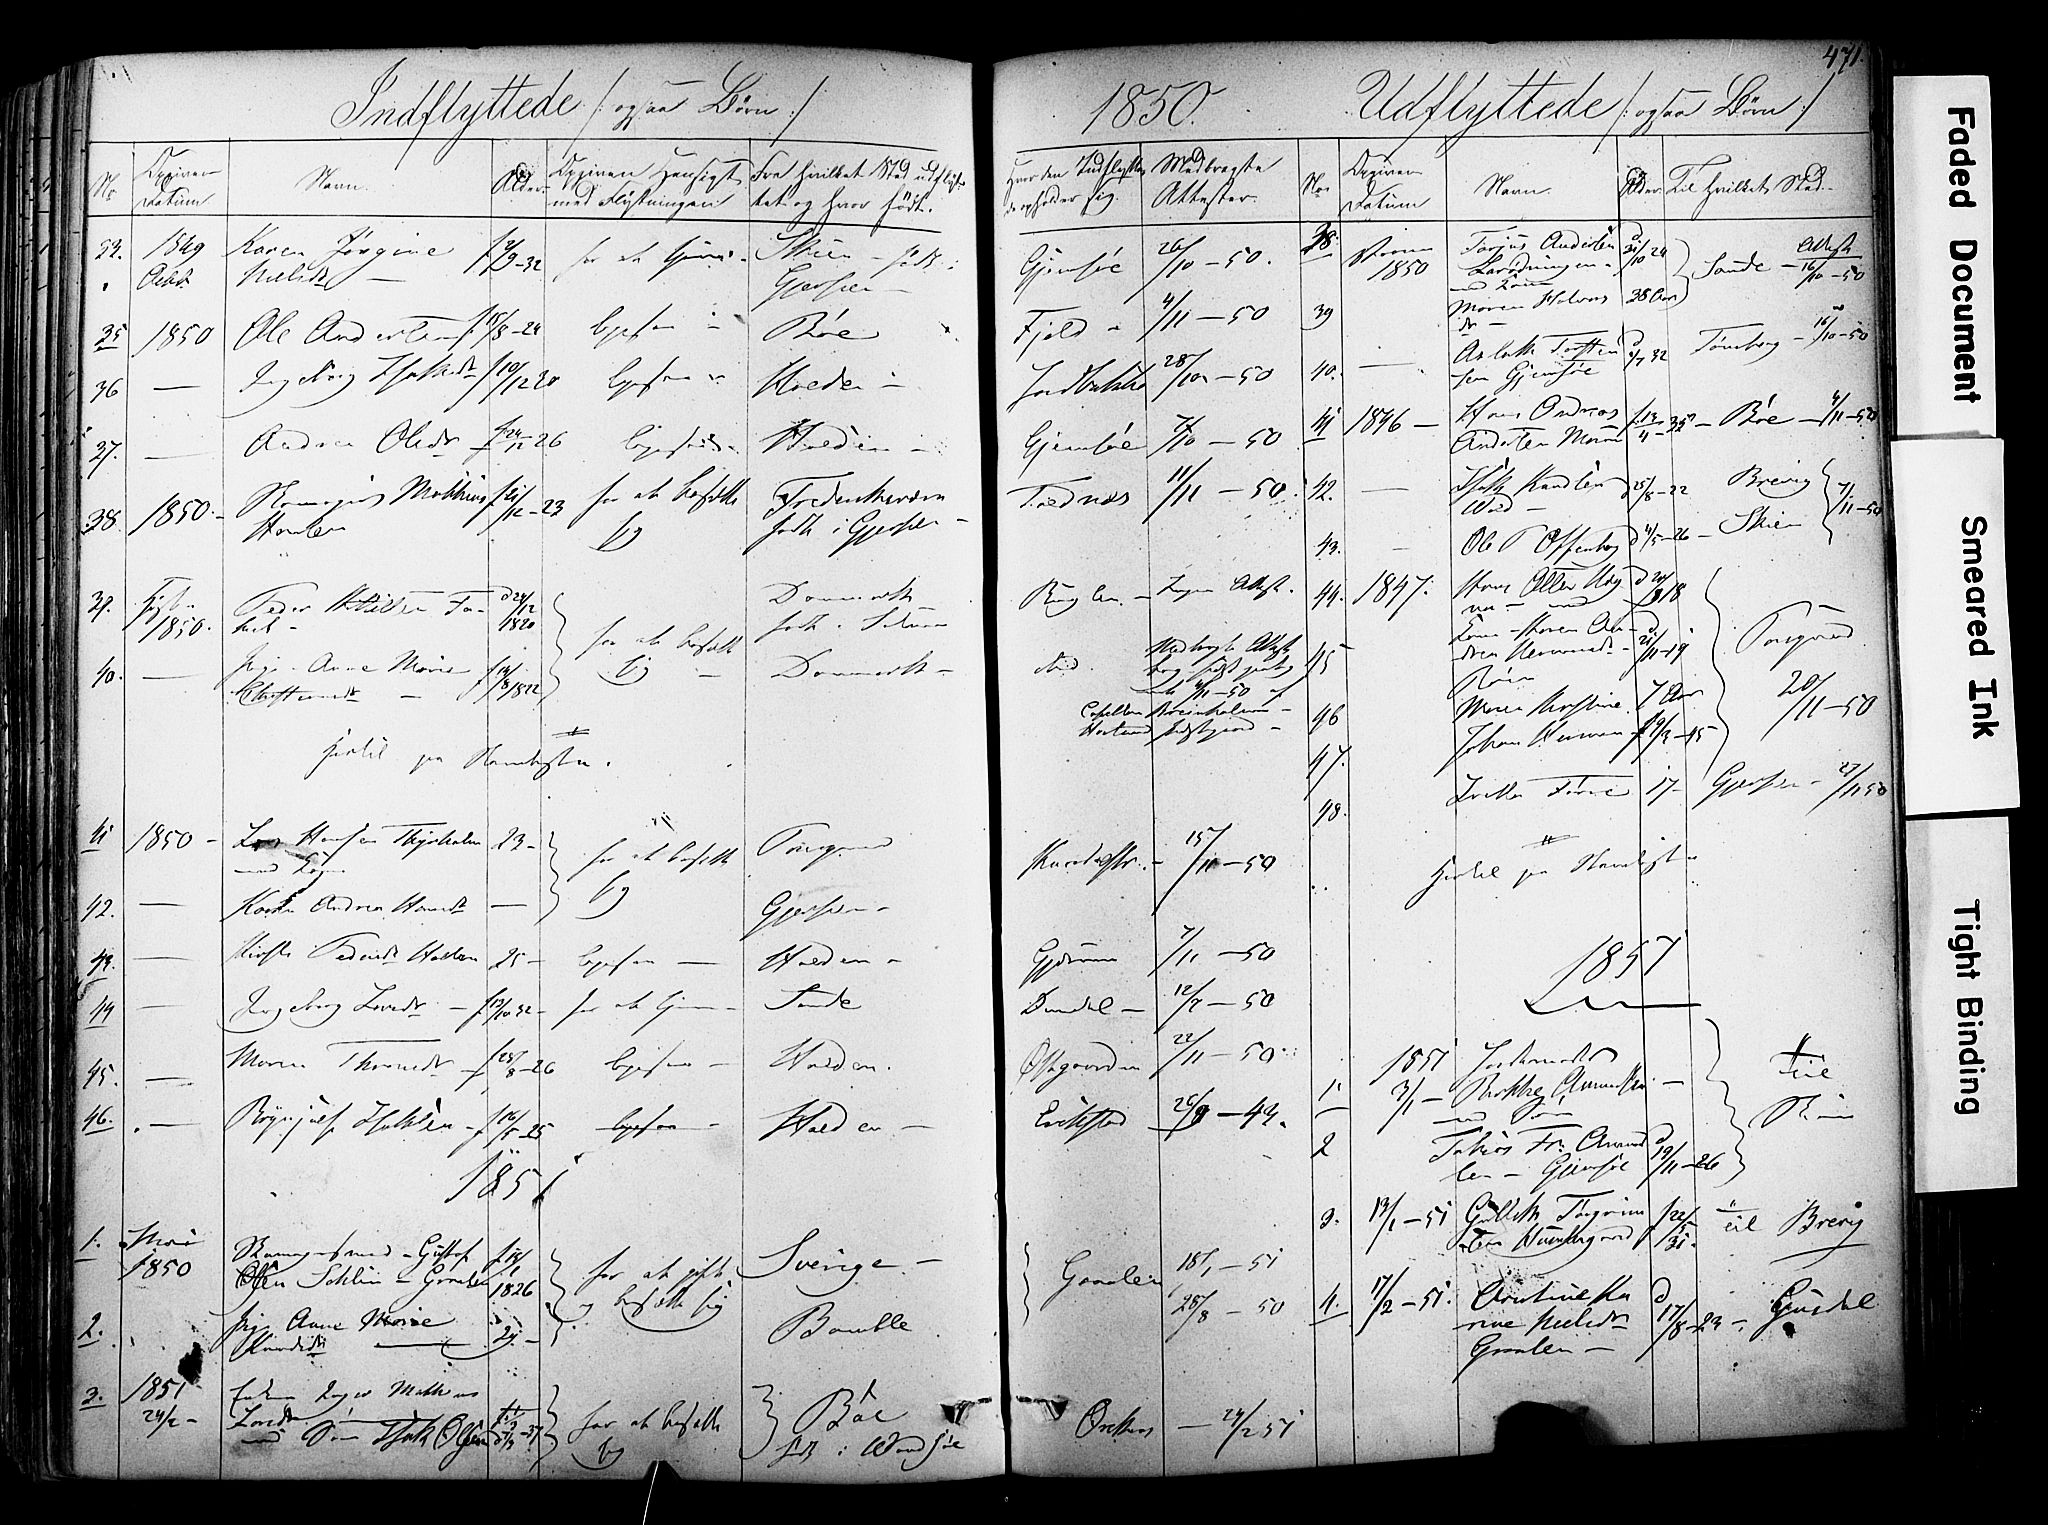 SAKO, Solum kirkebøker, F/Fa/L0006: Ministerialbok nr. I 6, 1844-1855, s. 471